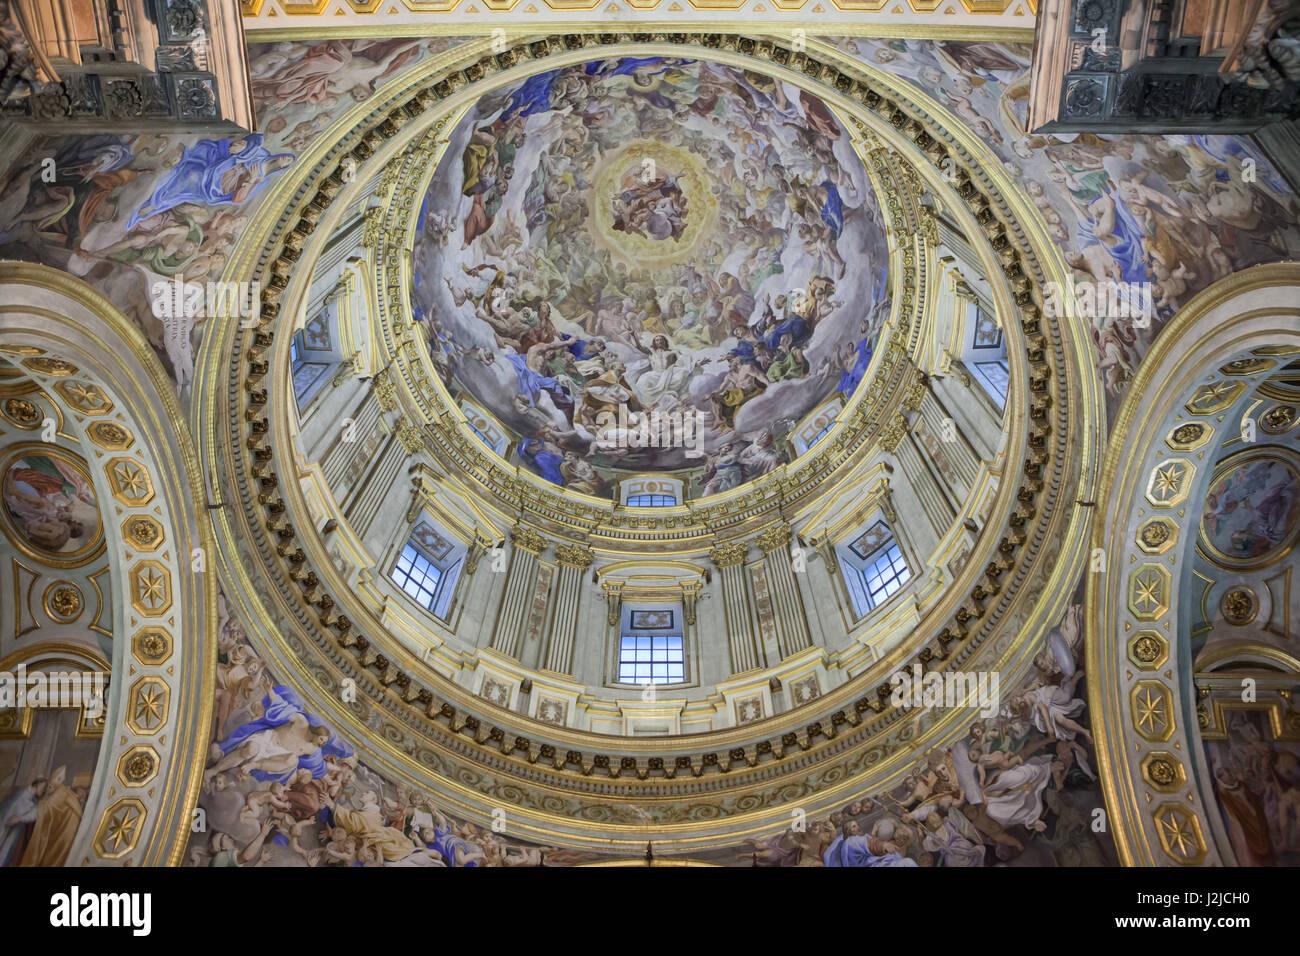 Baroque ceiling tile images tile flooring design ideas baroque ceiling tile images tile flooring design ideas baroque ceiling tile gallery tile flooring design ideas doublecrazyfo Gallery